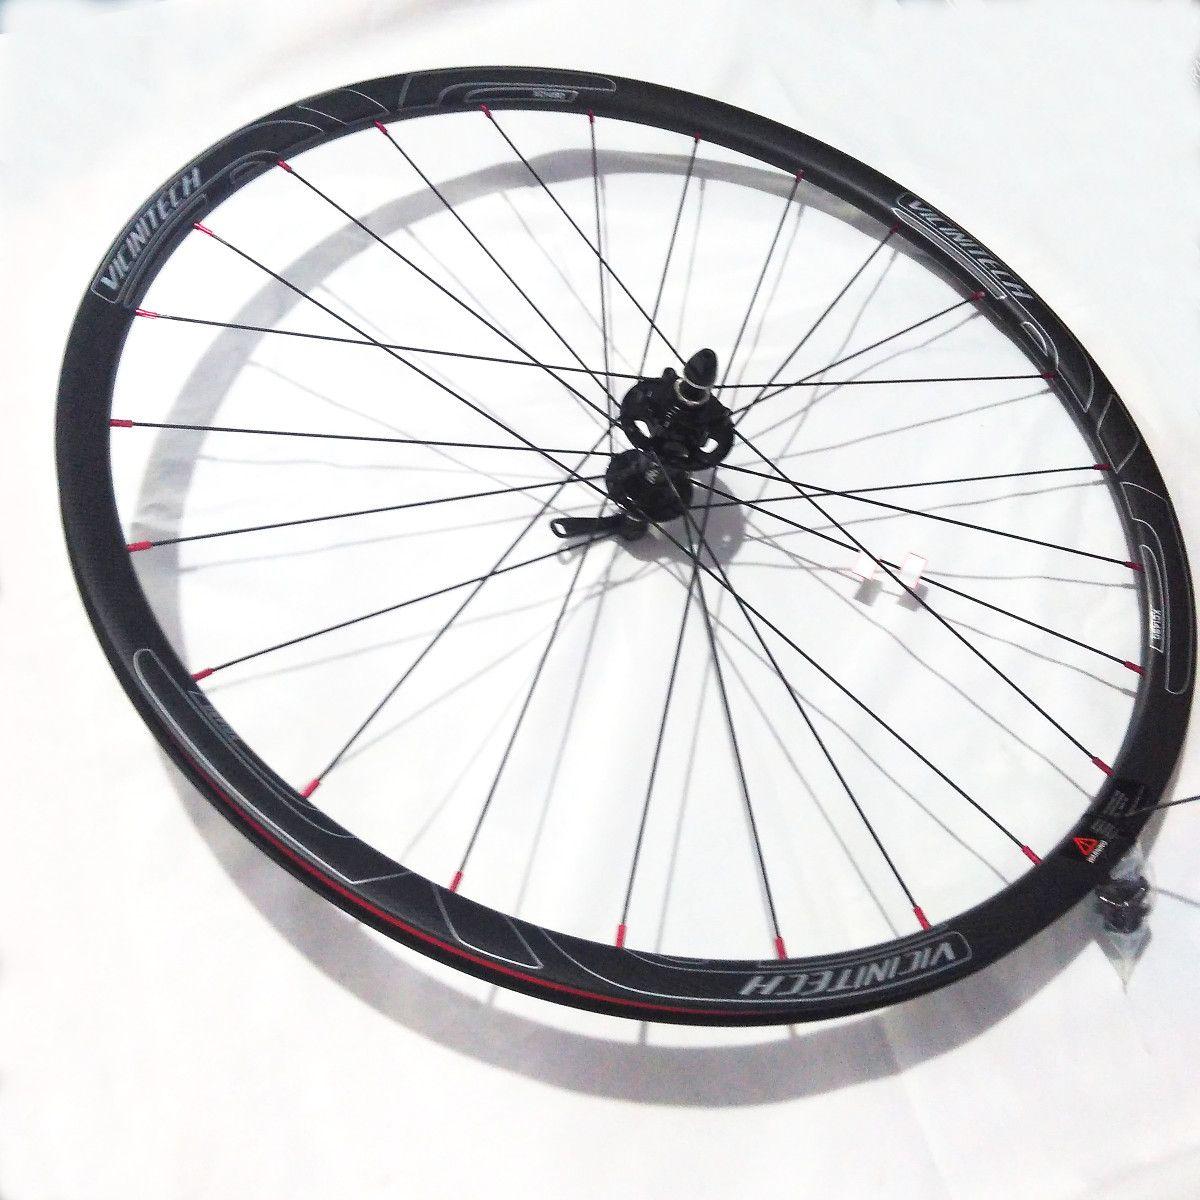 Par de rodas aro 29 de Carbono Vicinitech